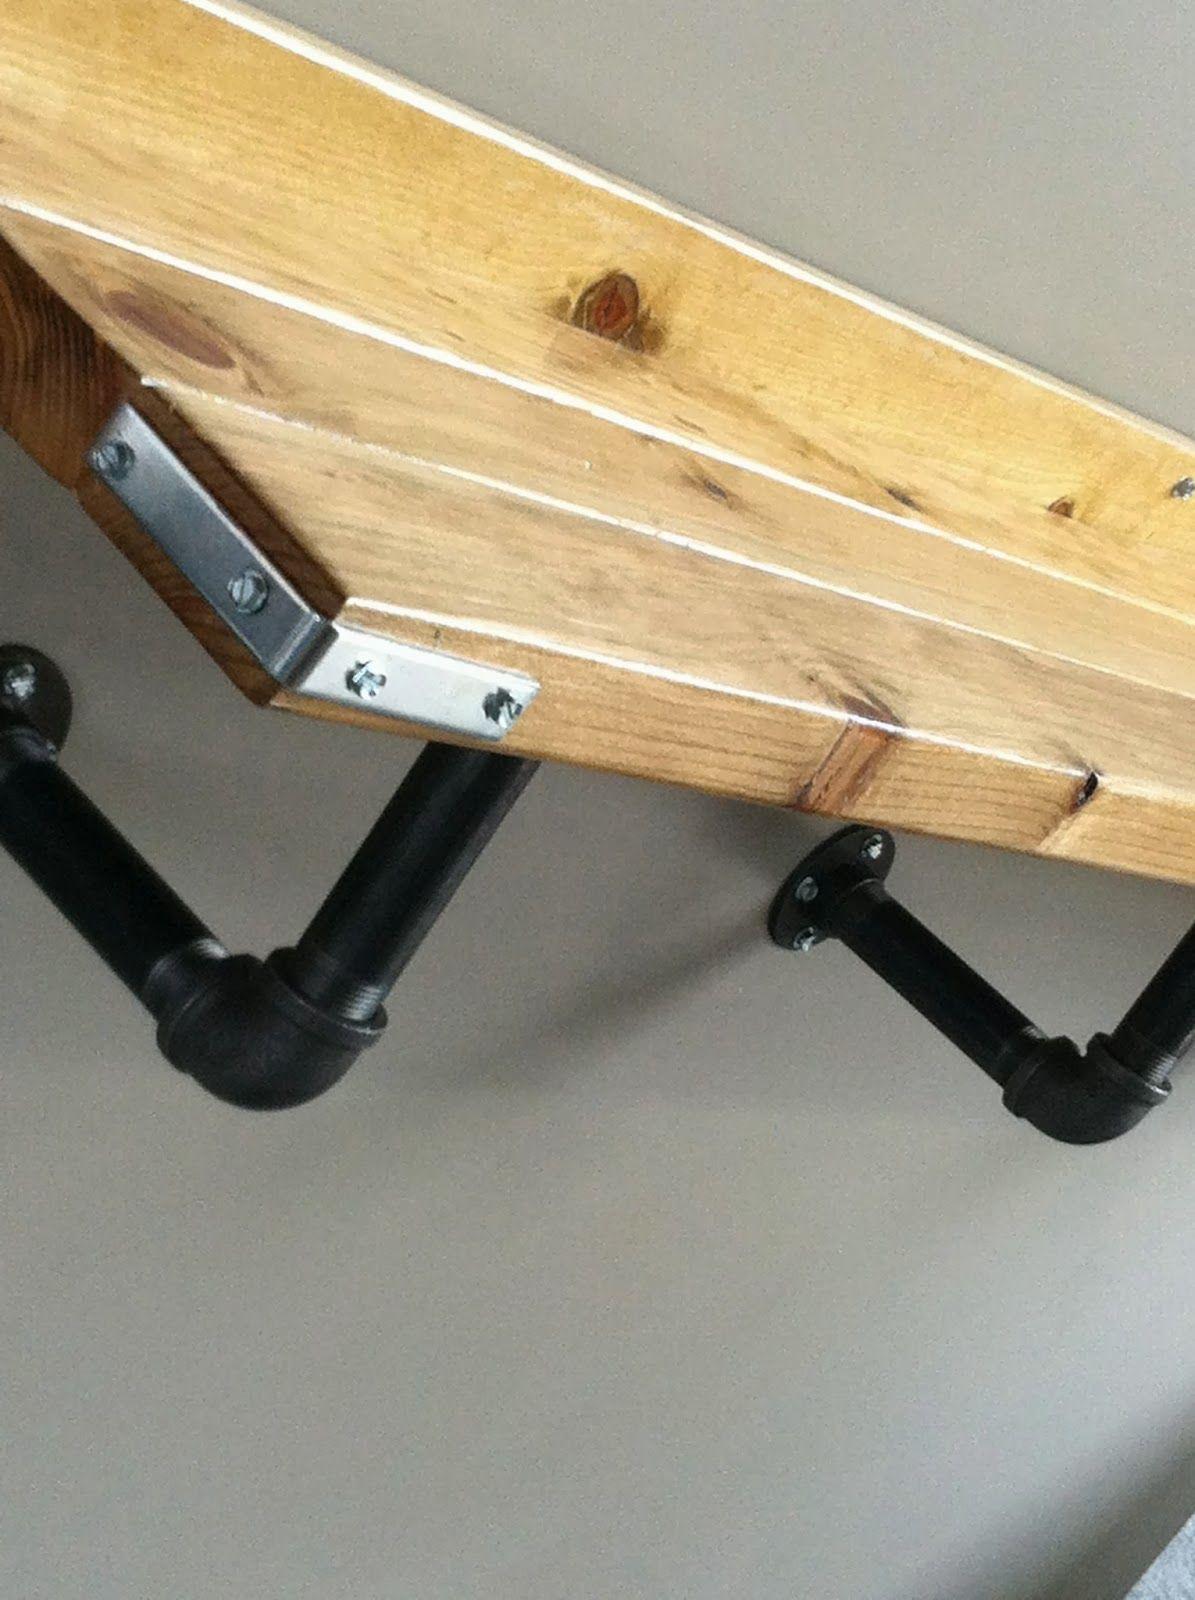 Easy Steampunk Bar Ledge Tutorial Hello all! I built this ledge (bar ...